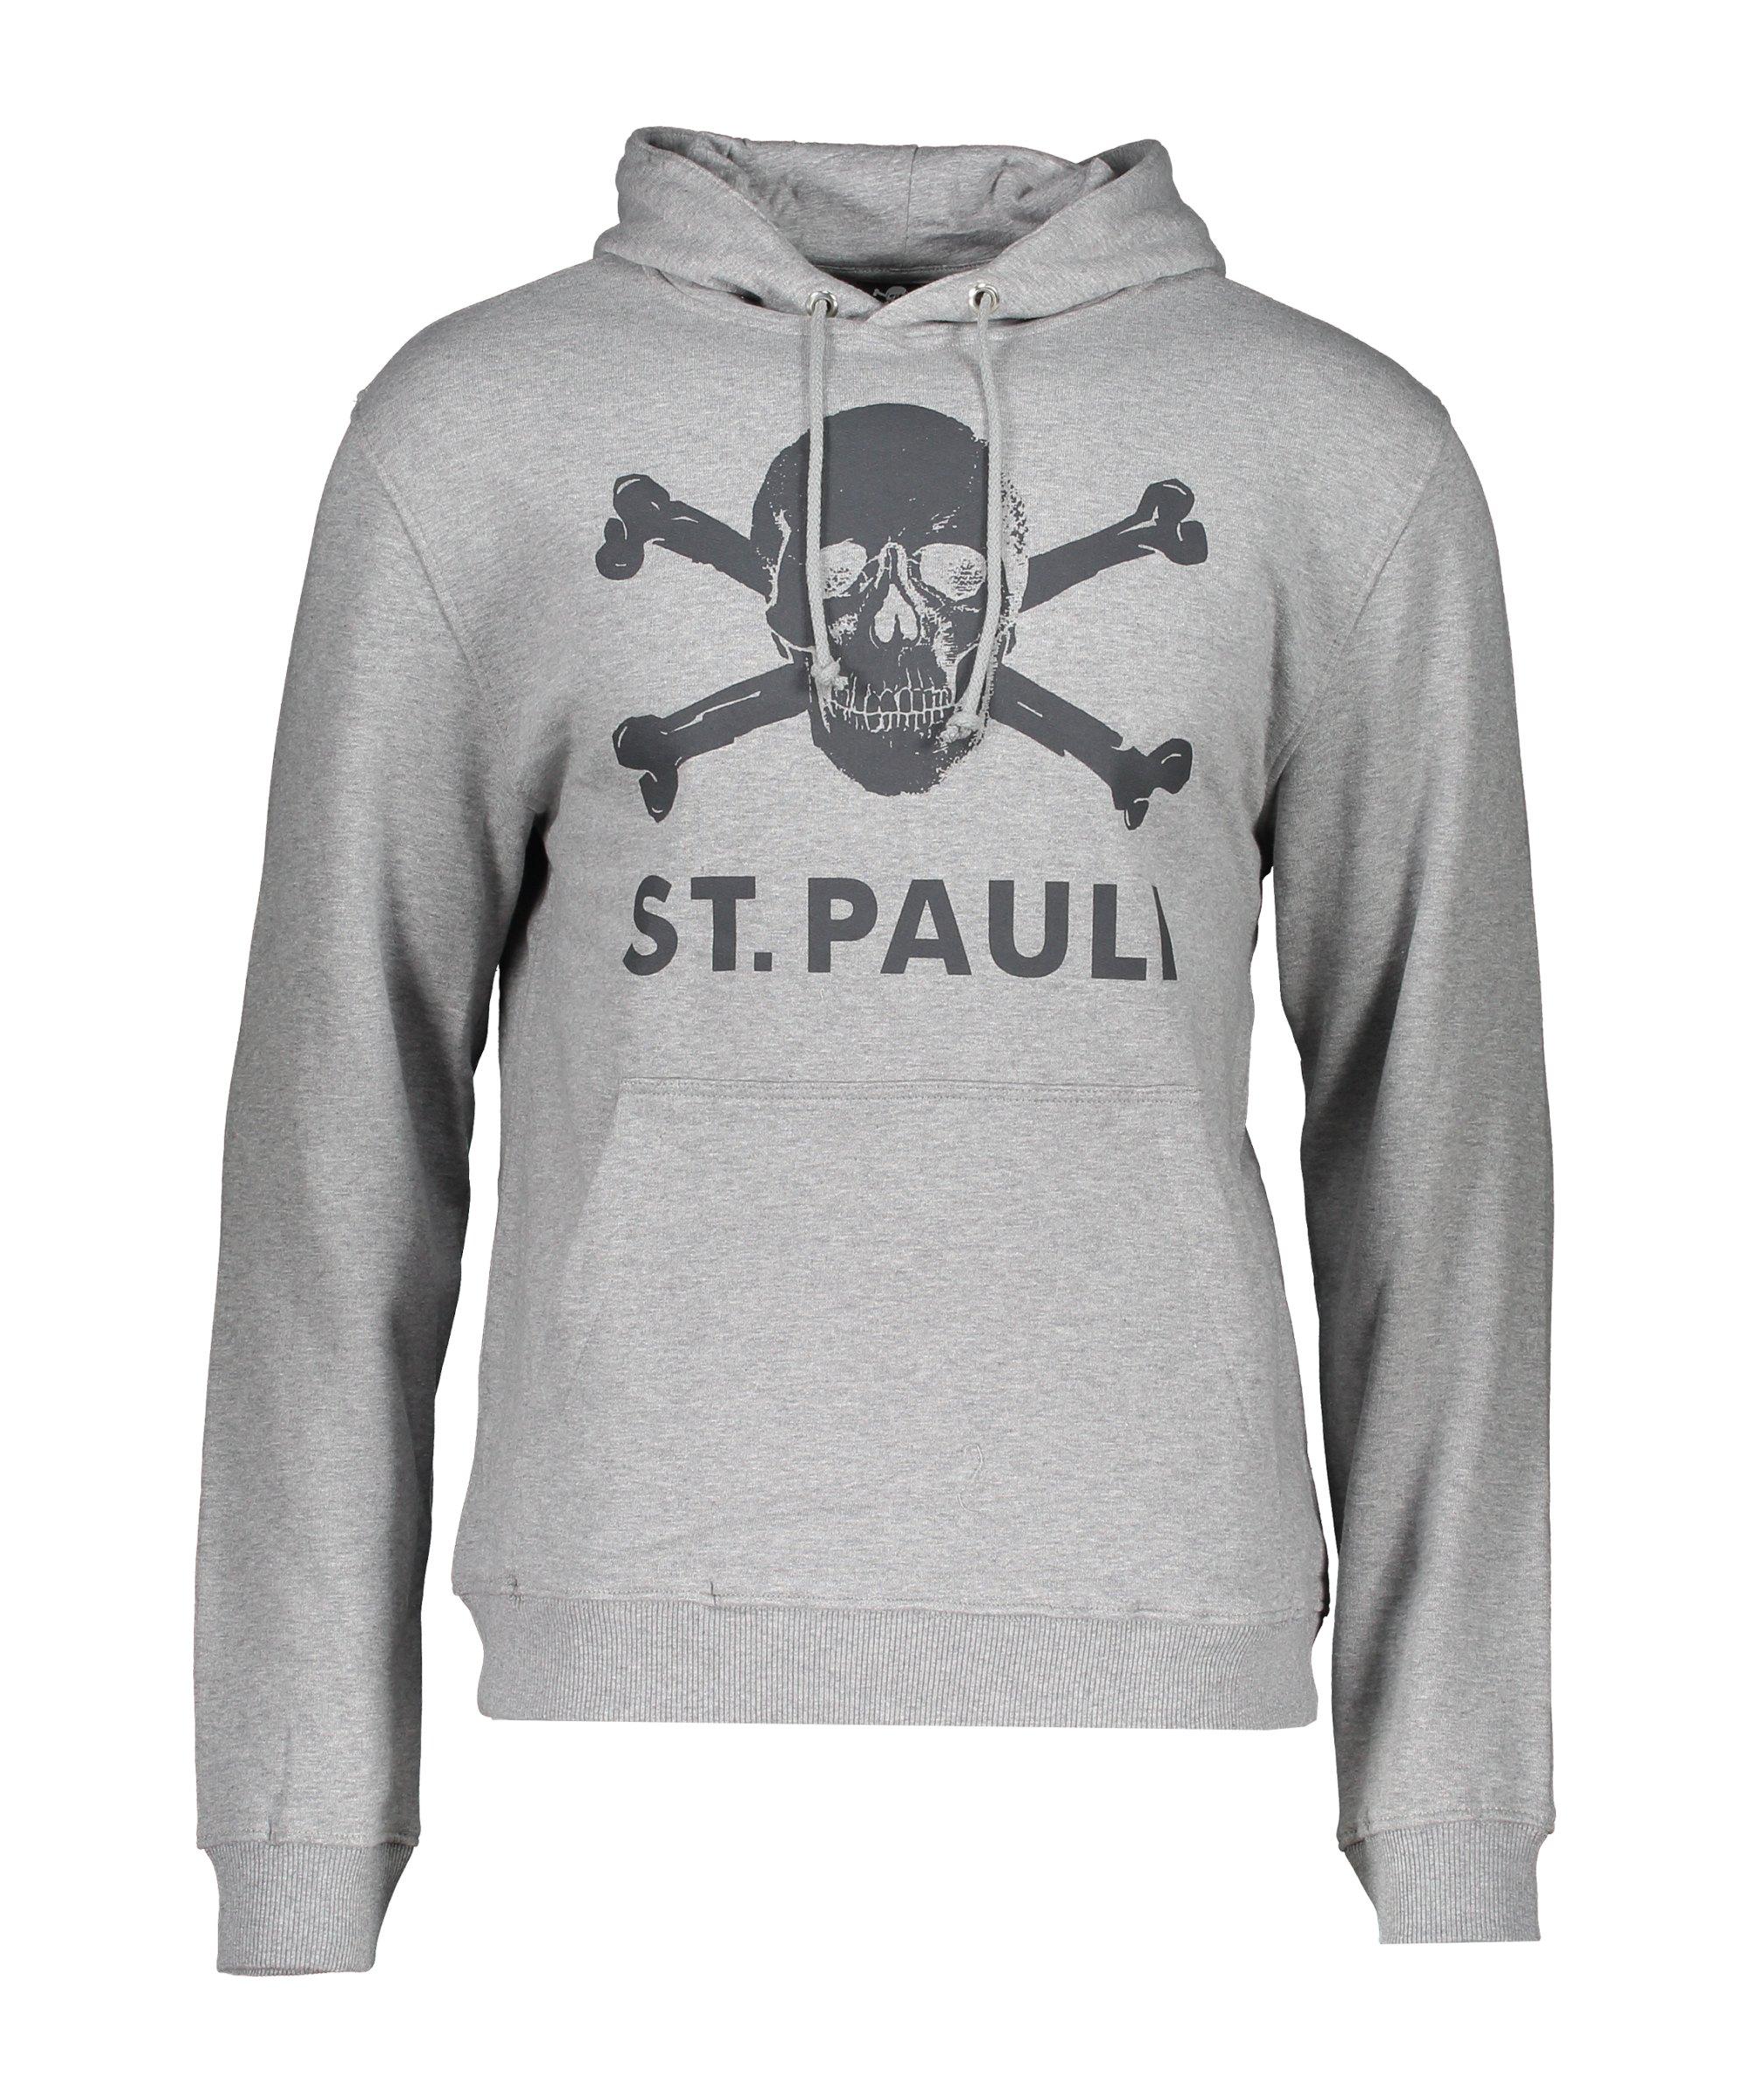 FC St. Pauli Totenkopf Hoody Grau - grau